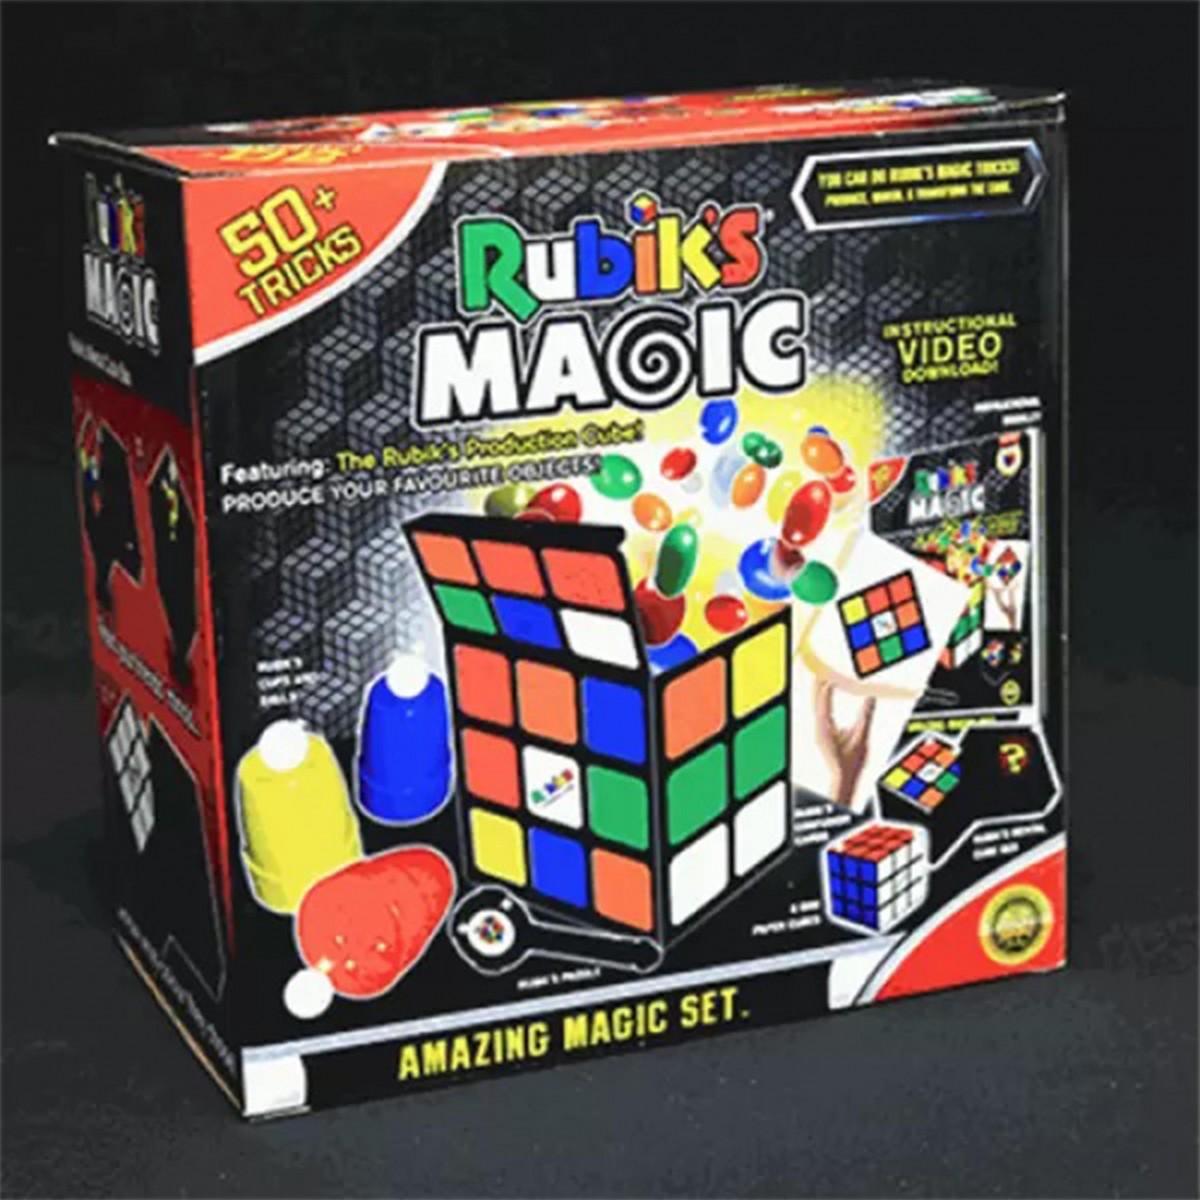 Rubik's Cube amazing magic set - 50 giochi